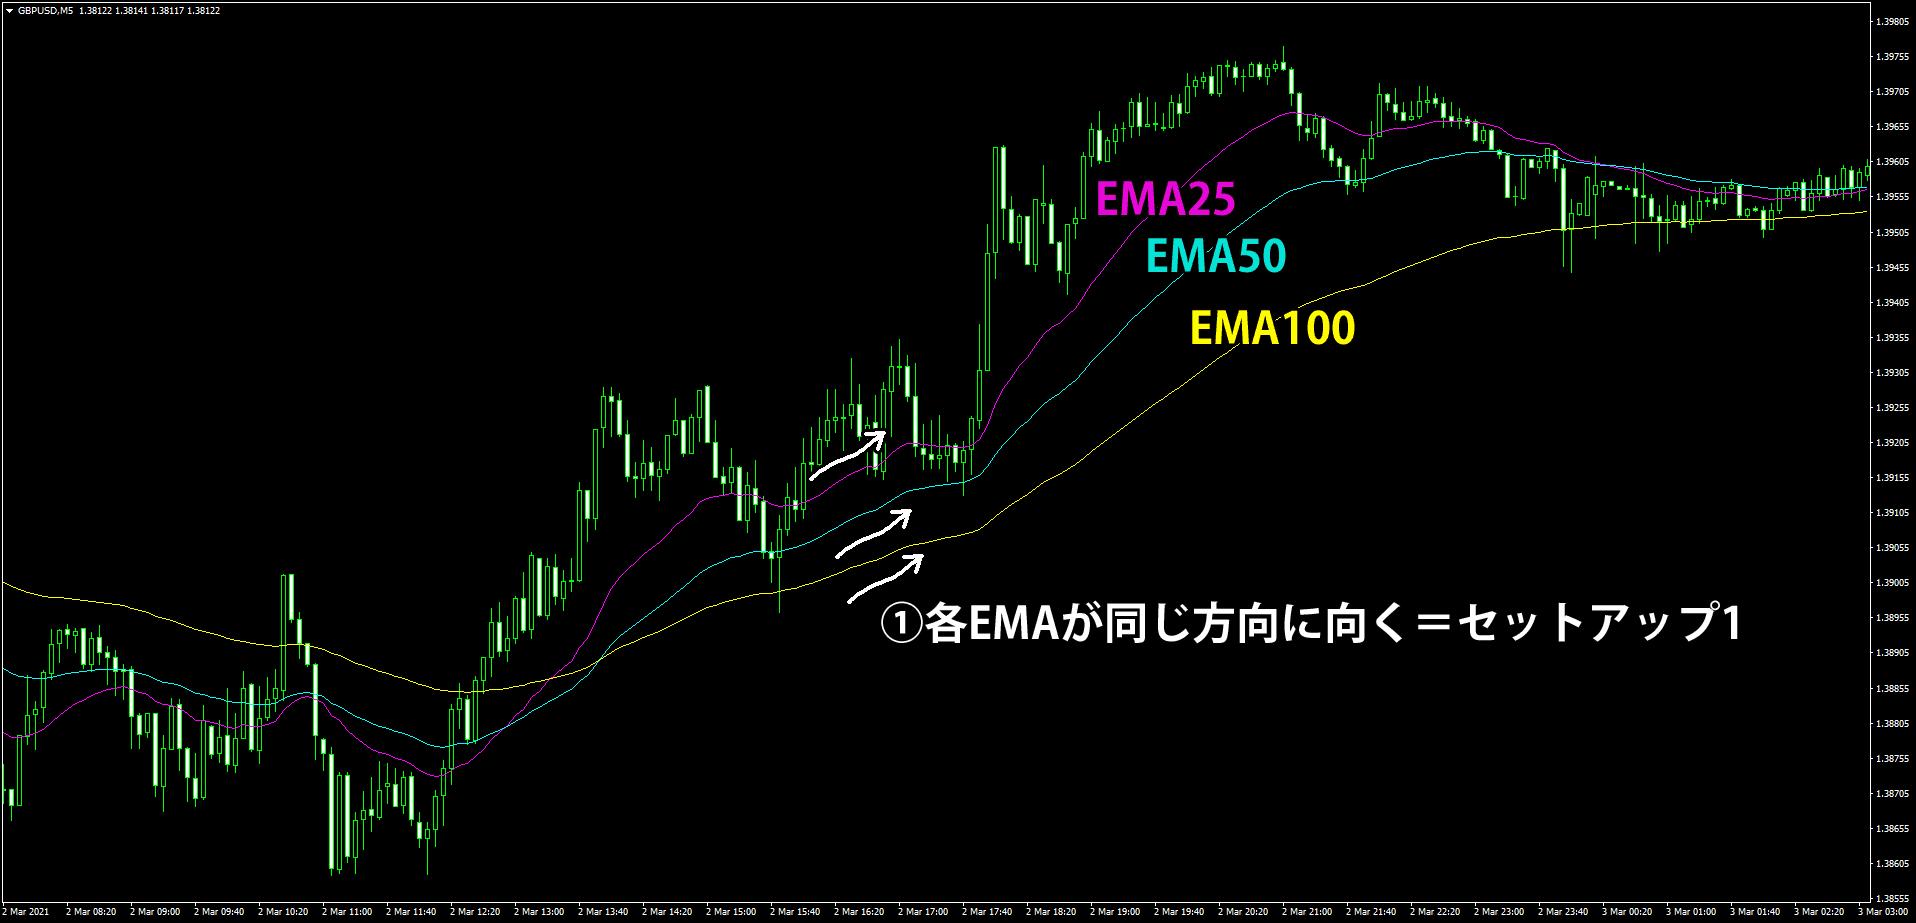 EMA3本を使う5分足スキャルピング手法の解説(セットアップ編1)